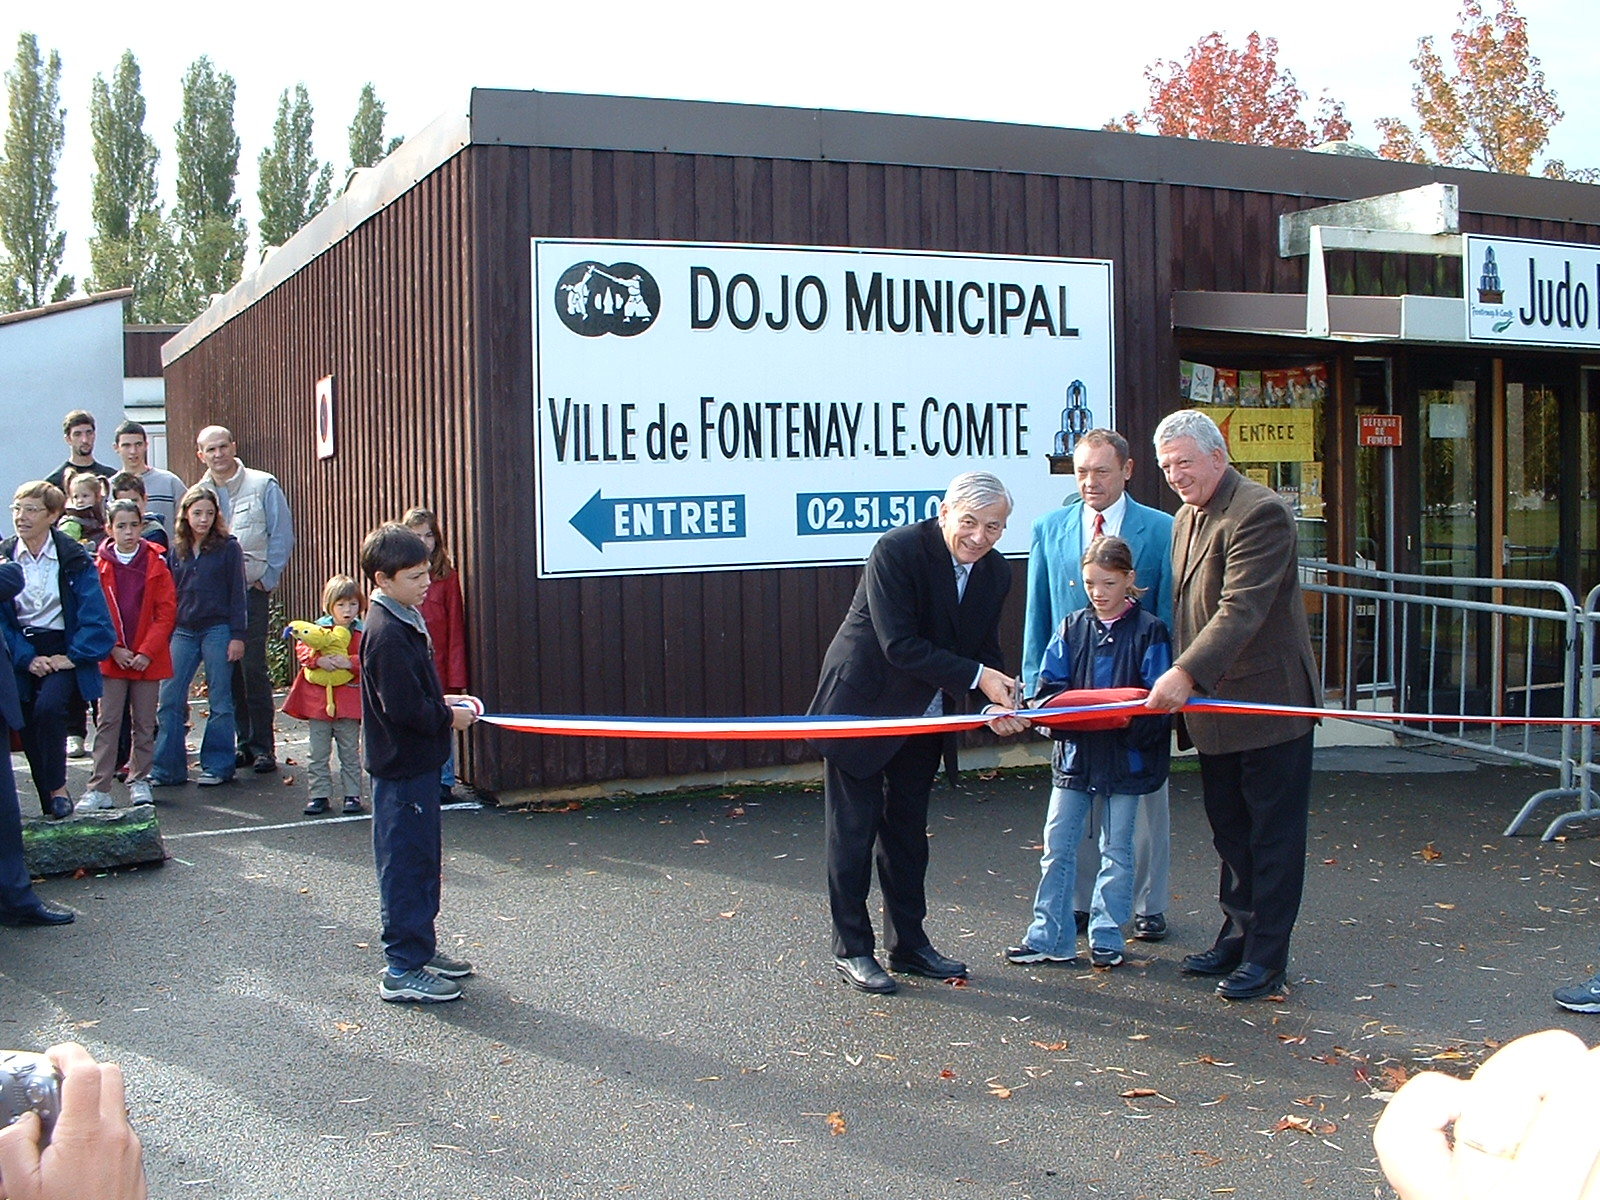 inauguration dojo 2004